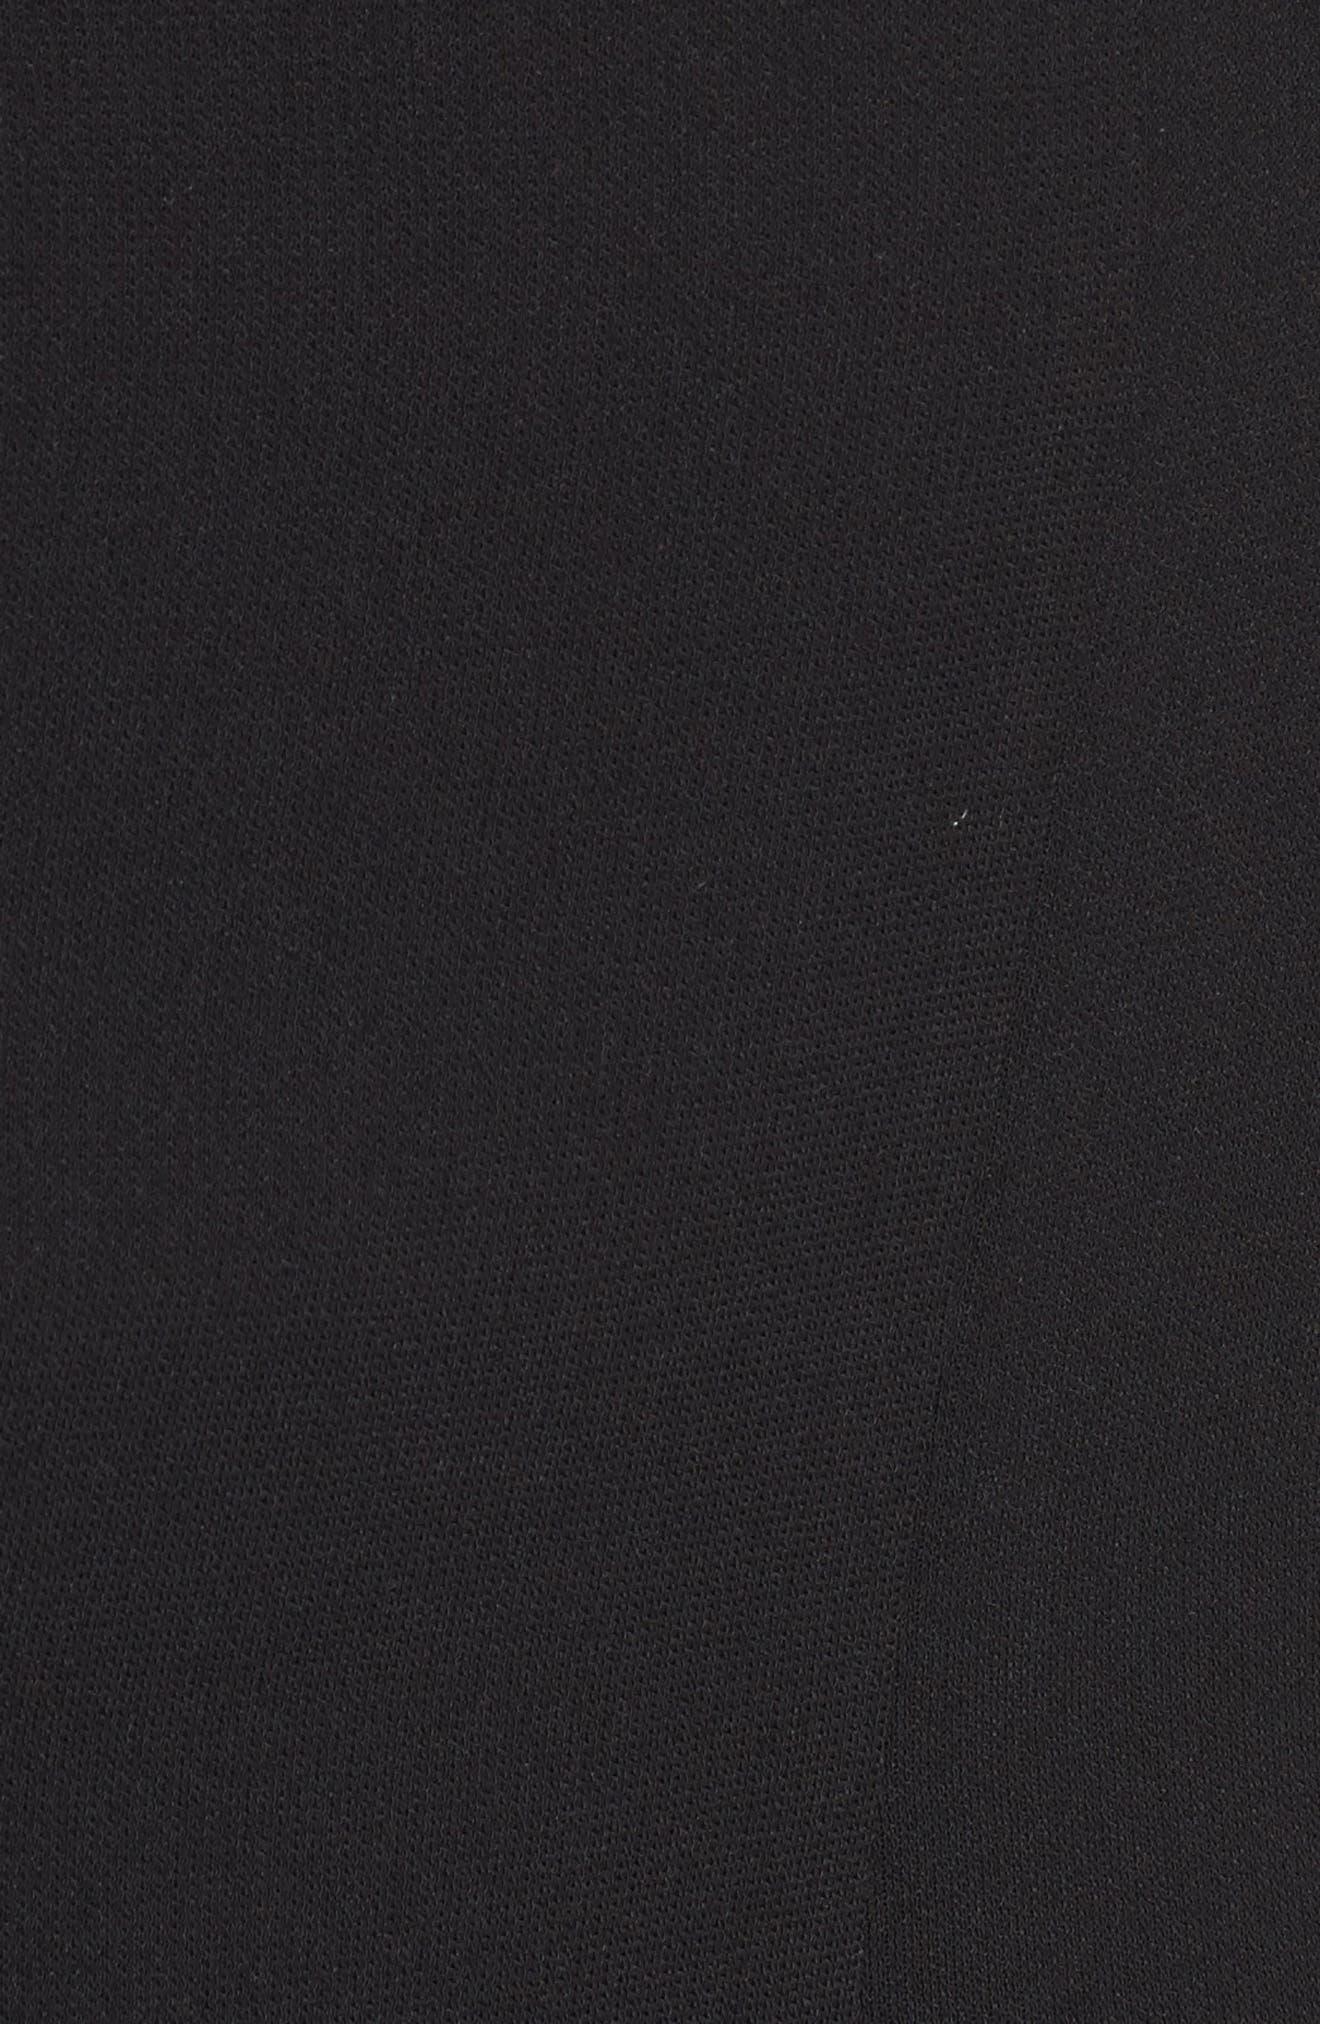 Tie Sleeve Romper,                             Alternate thumbnail 5, color,                             Black